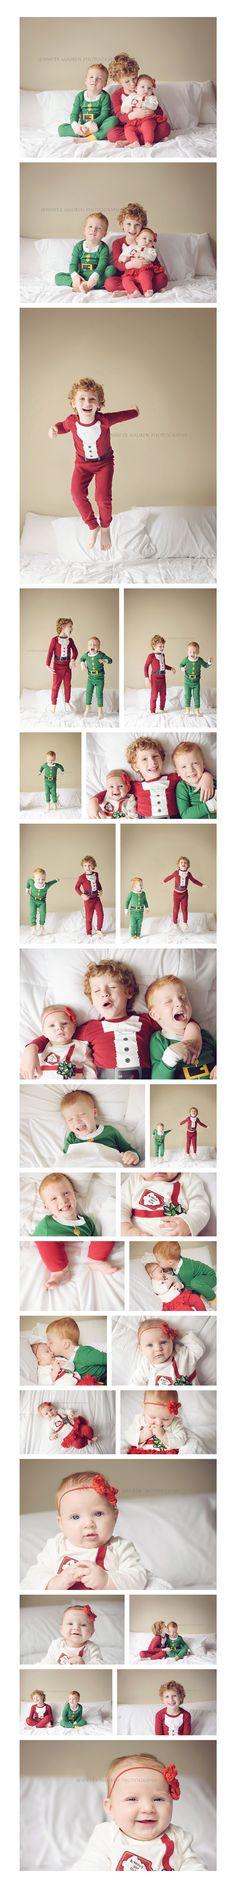 kids christmas session secrets revealed!!